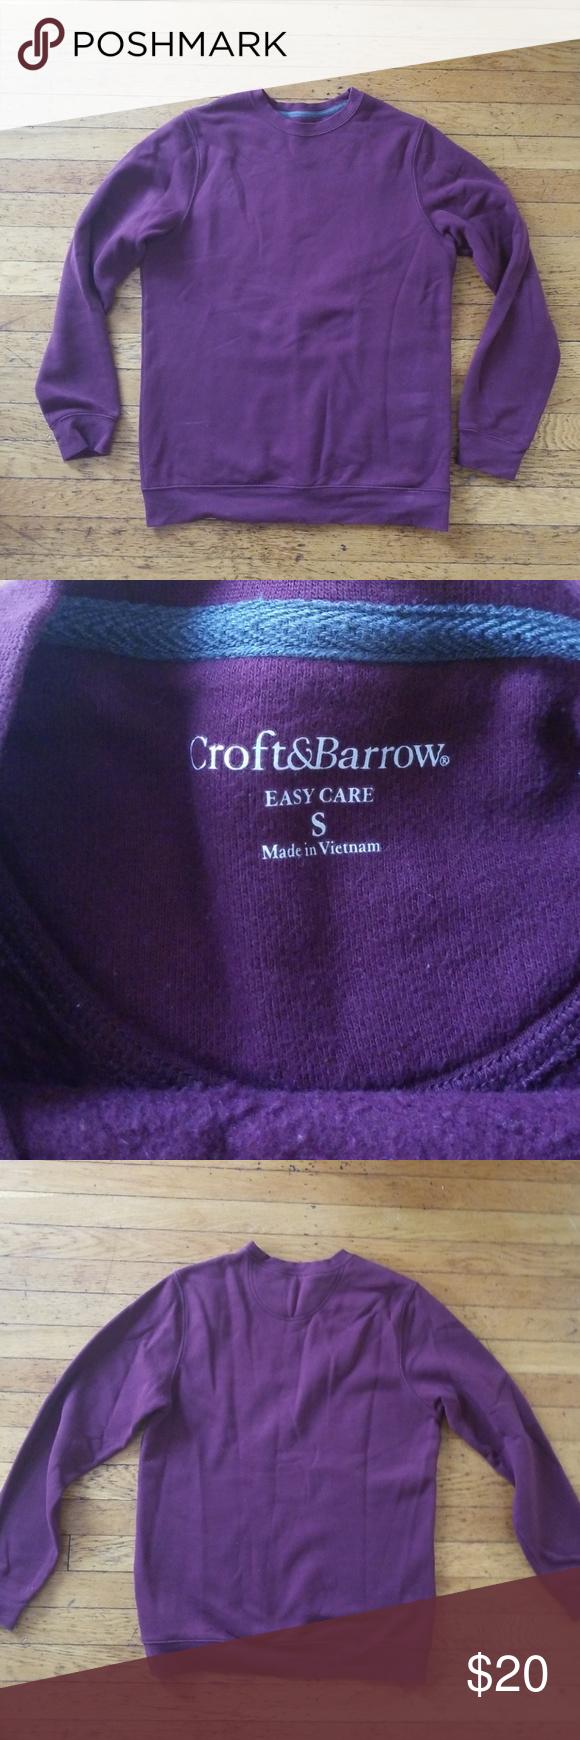 Croft And Barrow Crewneck Sweatshirt Crew Neck Sweatshirt Sweatshirts Croft And Barrow [ 1740 x 580 Pixel ]